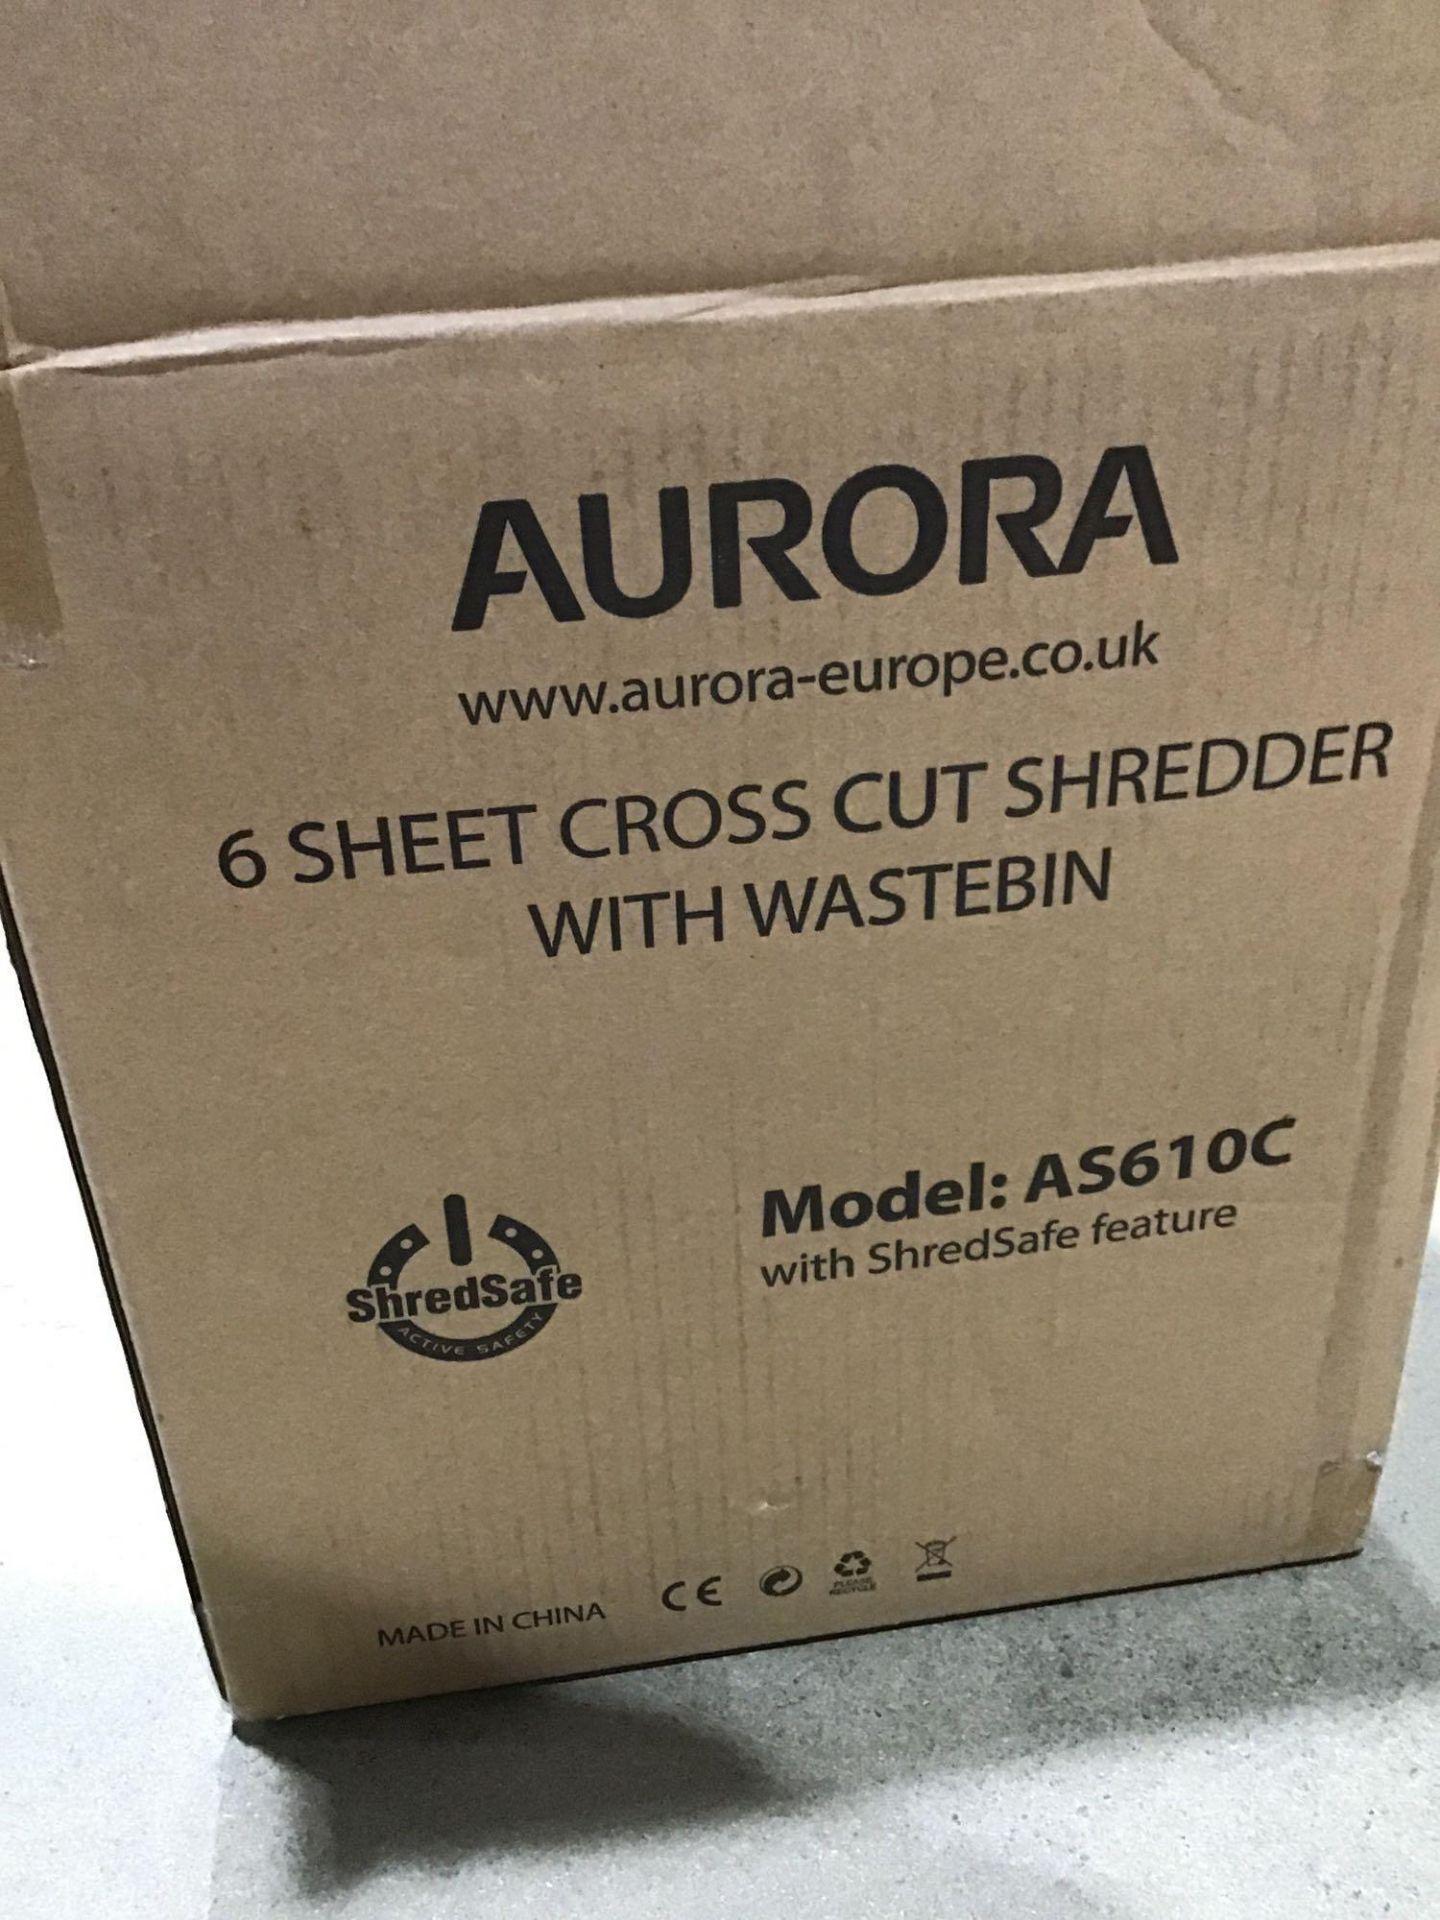 Aurora AS610C 6 Sheet Cross-Cut Shredder with Waste Bin, Black/Silver £39.59 RRP - Image 3 of 4